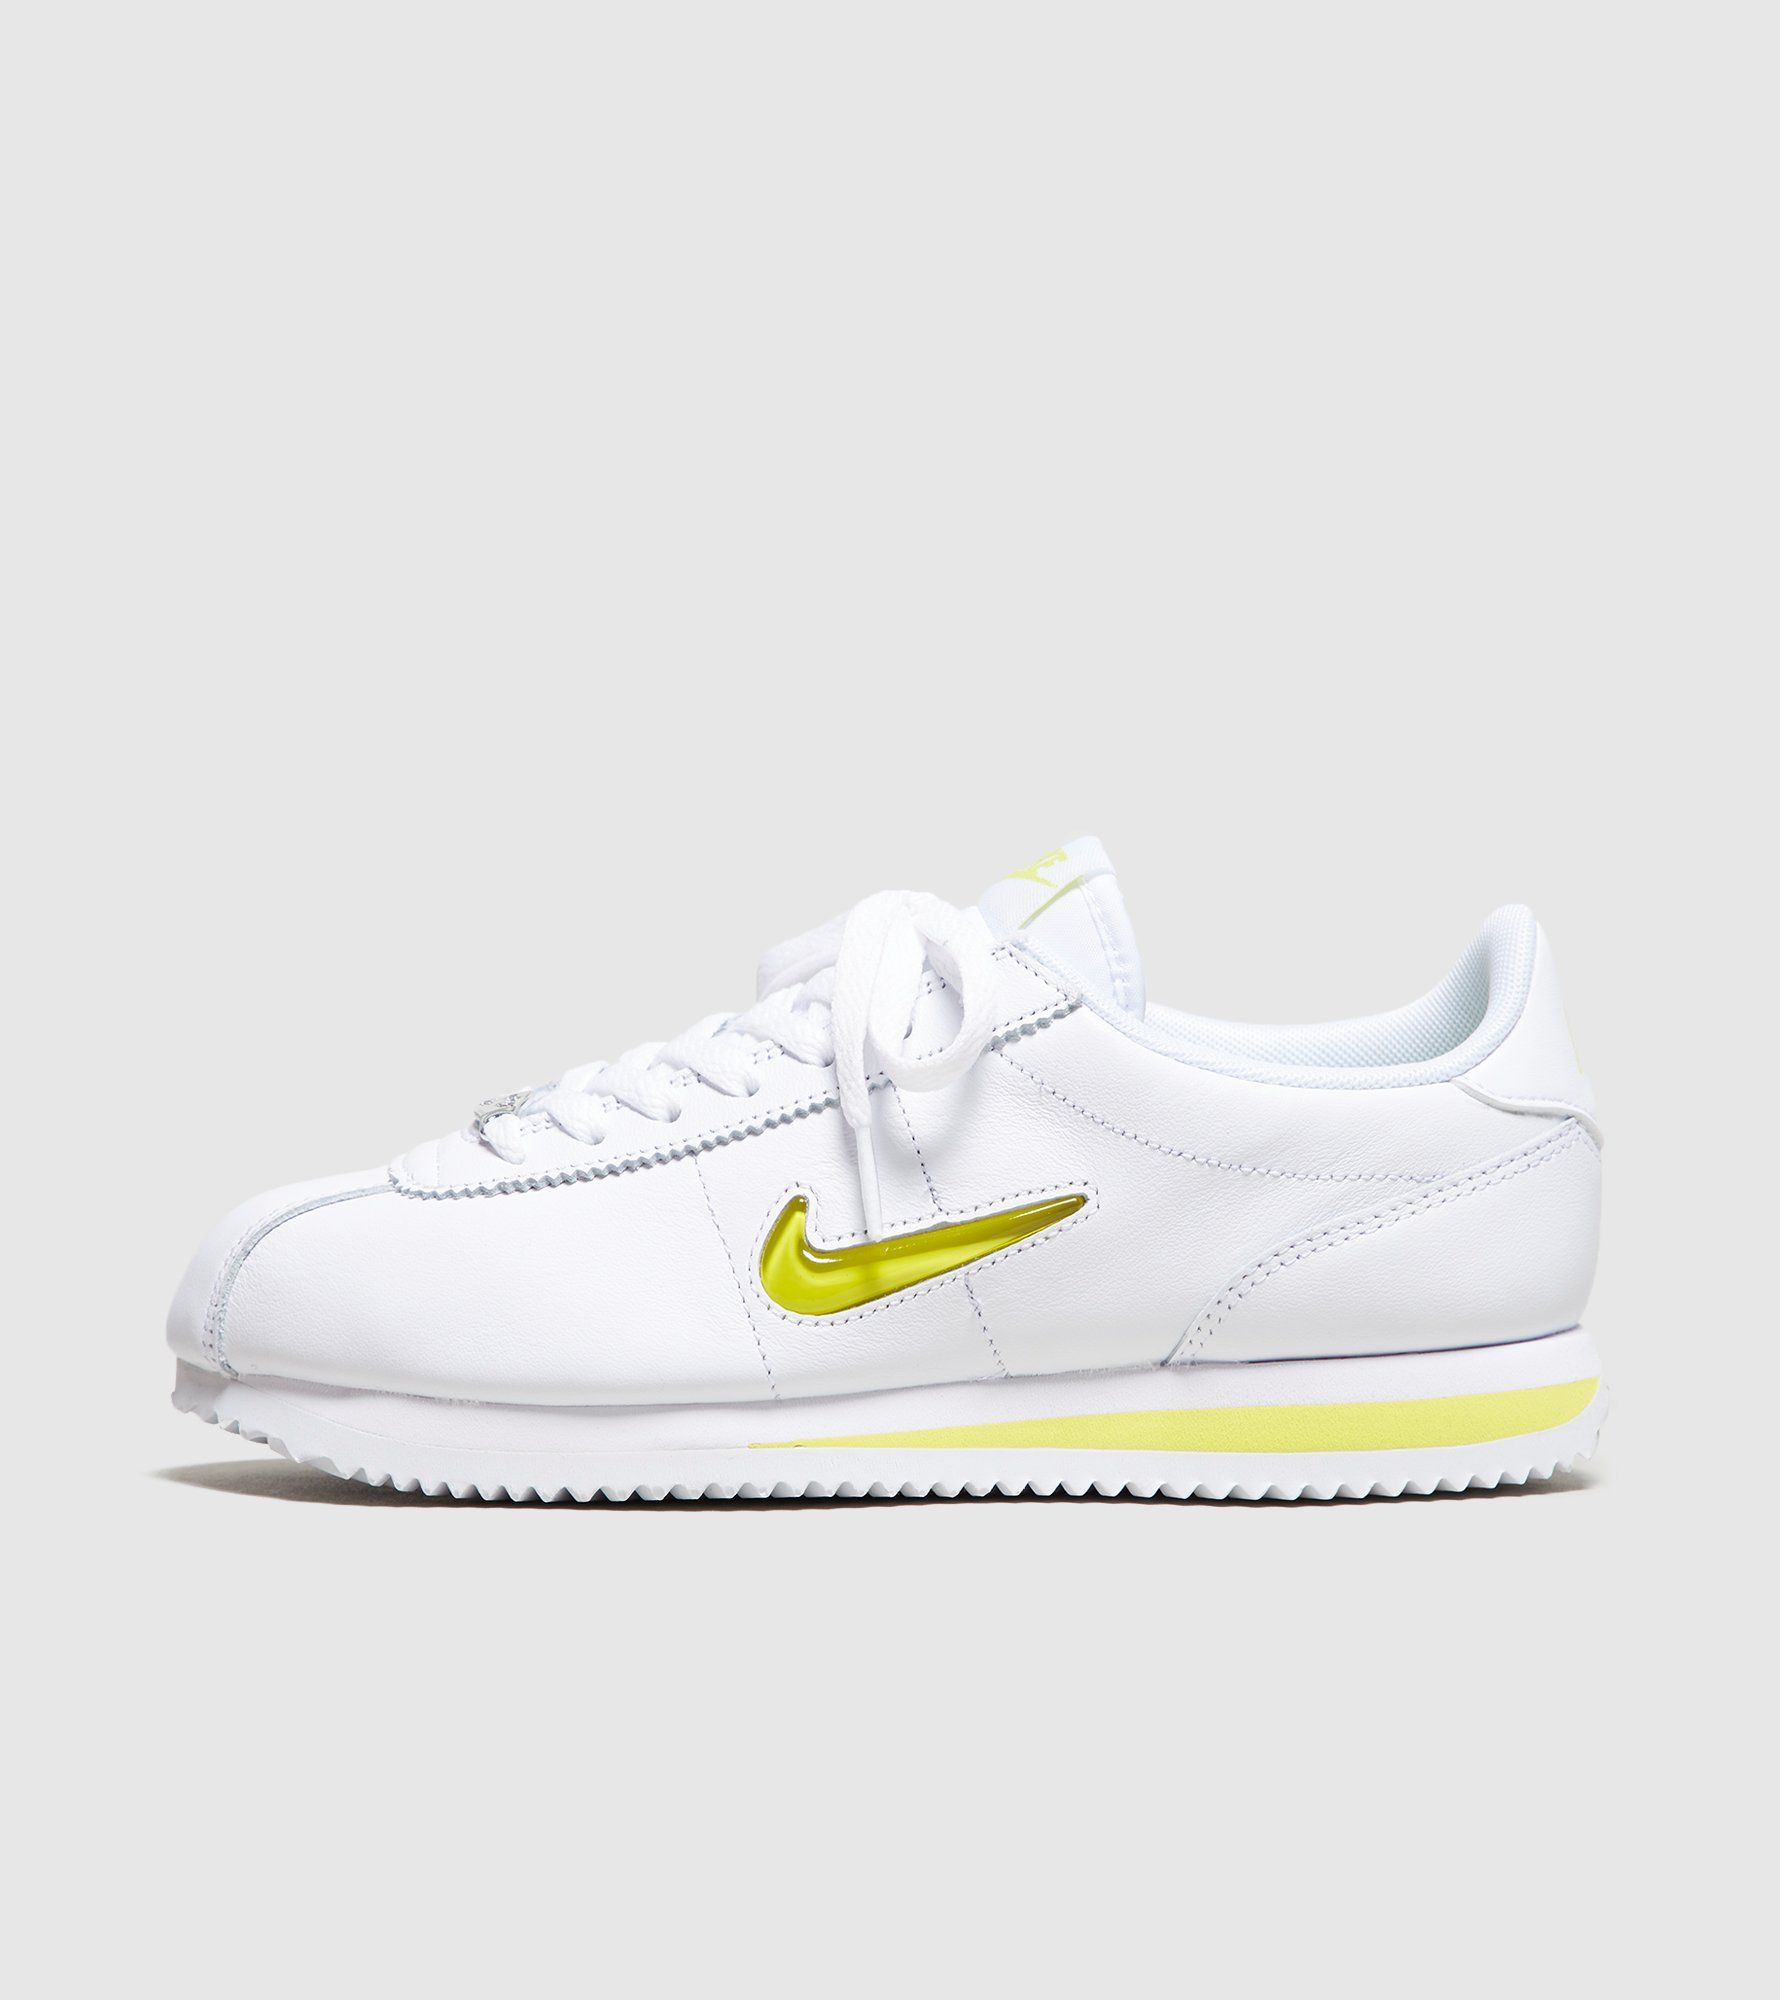 Nike Cortez Jewel Women's